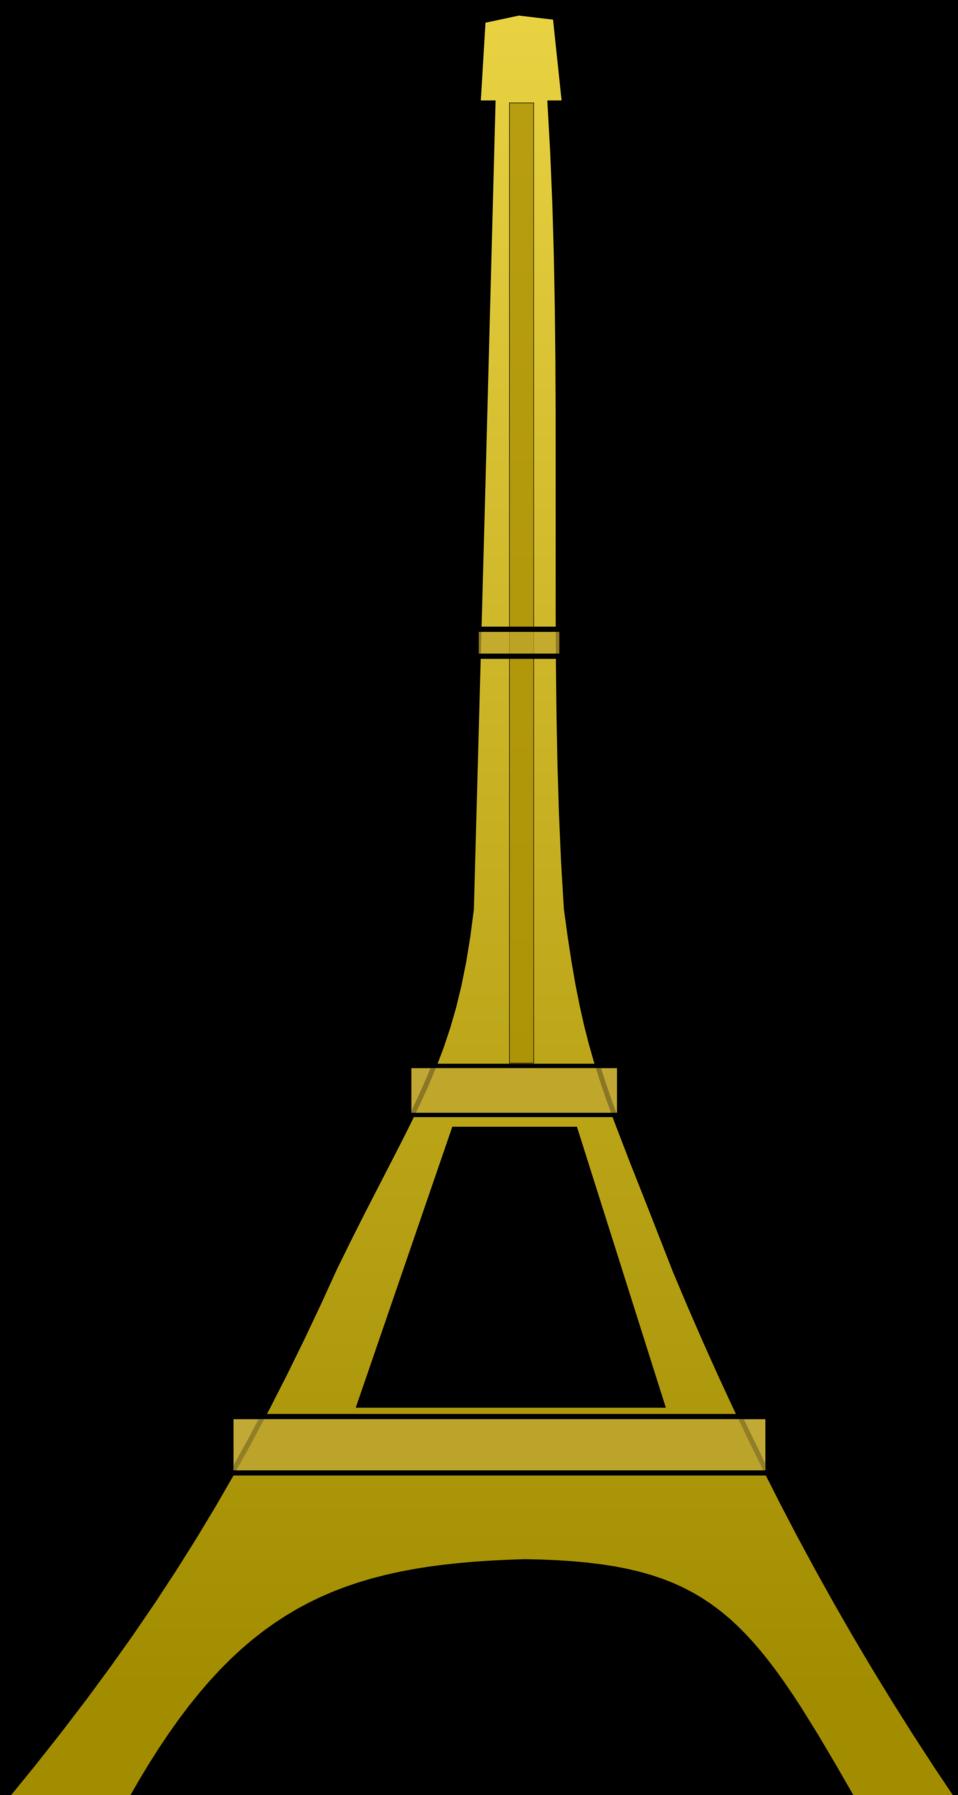 Illustration of the Eiffel Tower